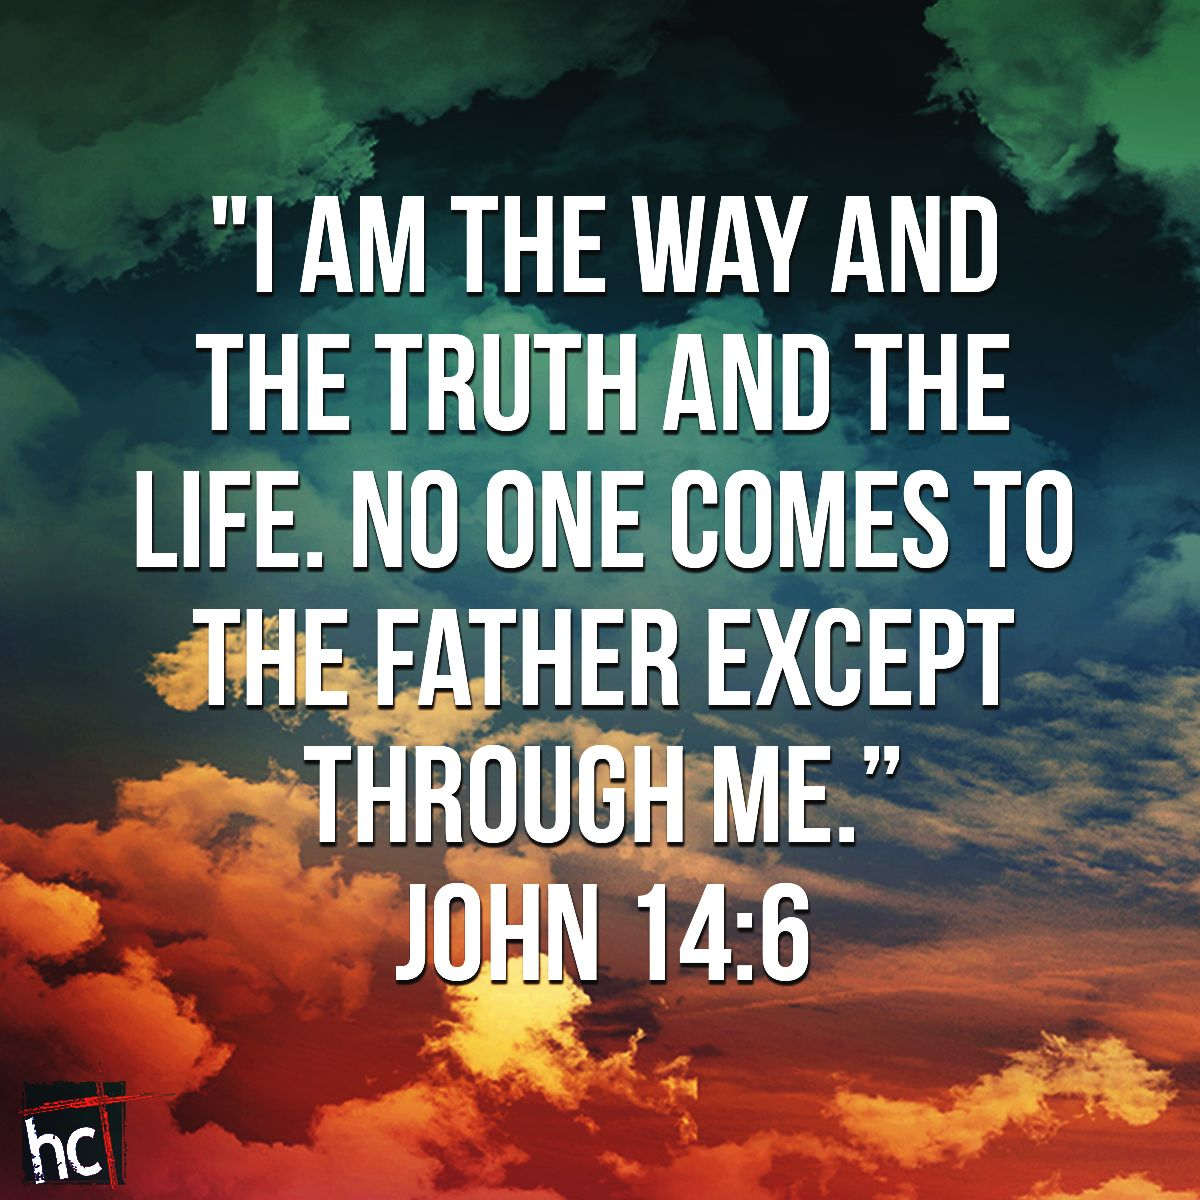 Bible verse ~ John 14:6